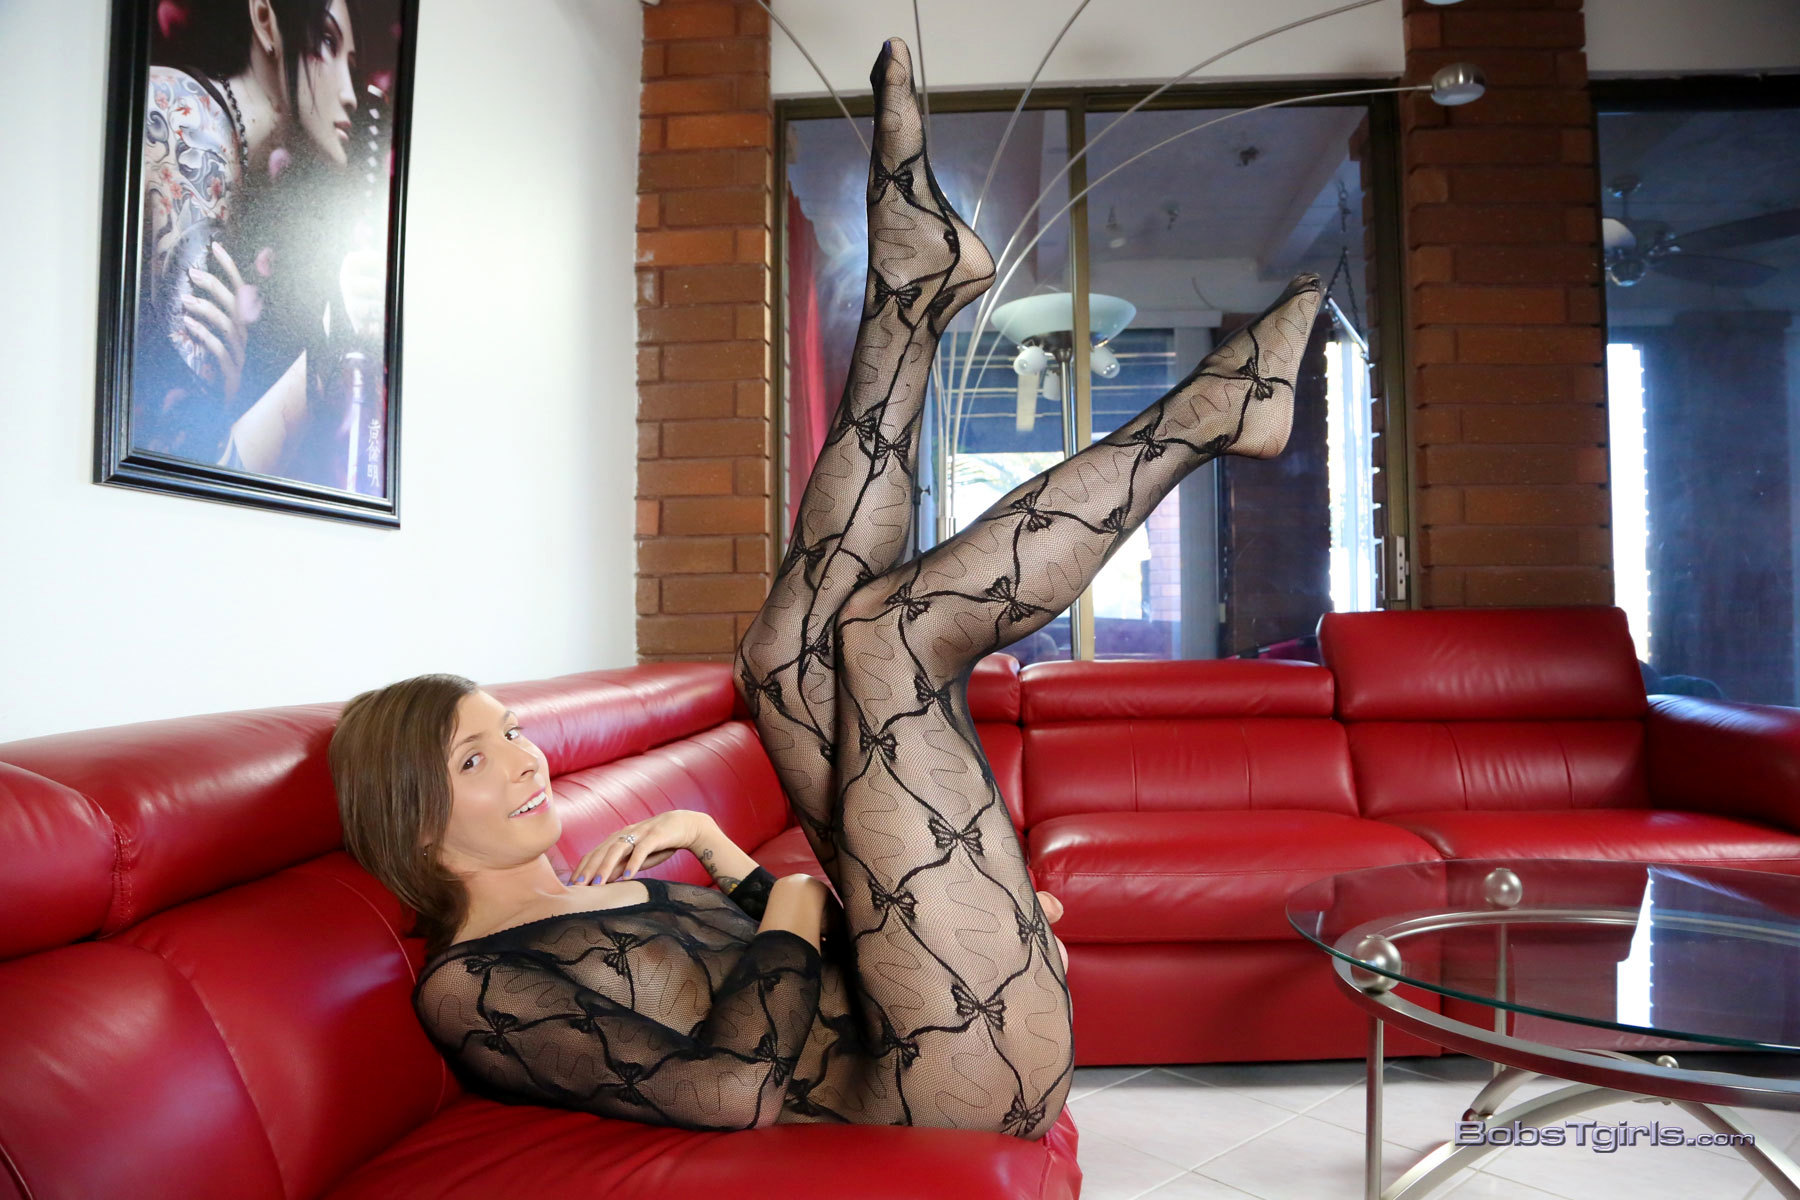 Nice Sienna Poses And Rub's